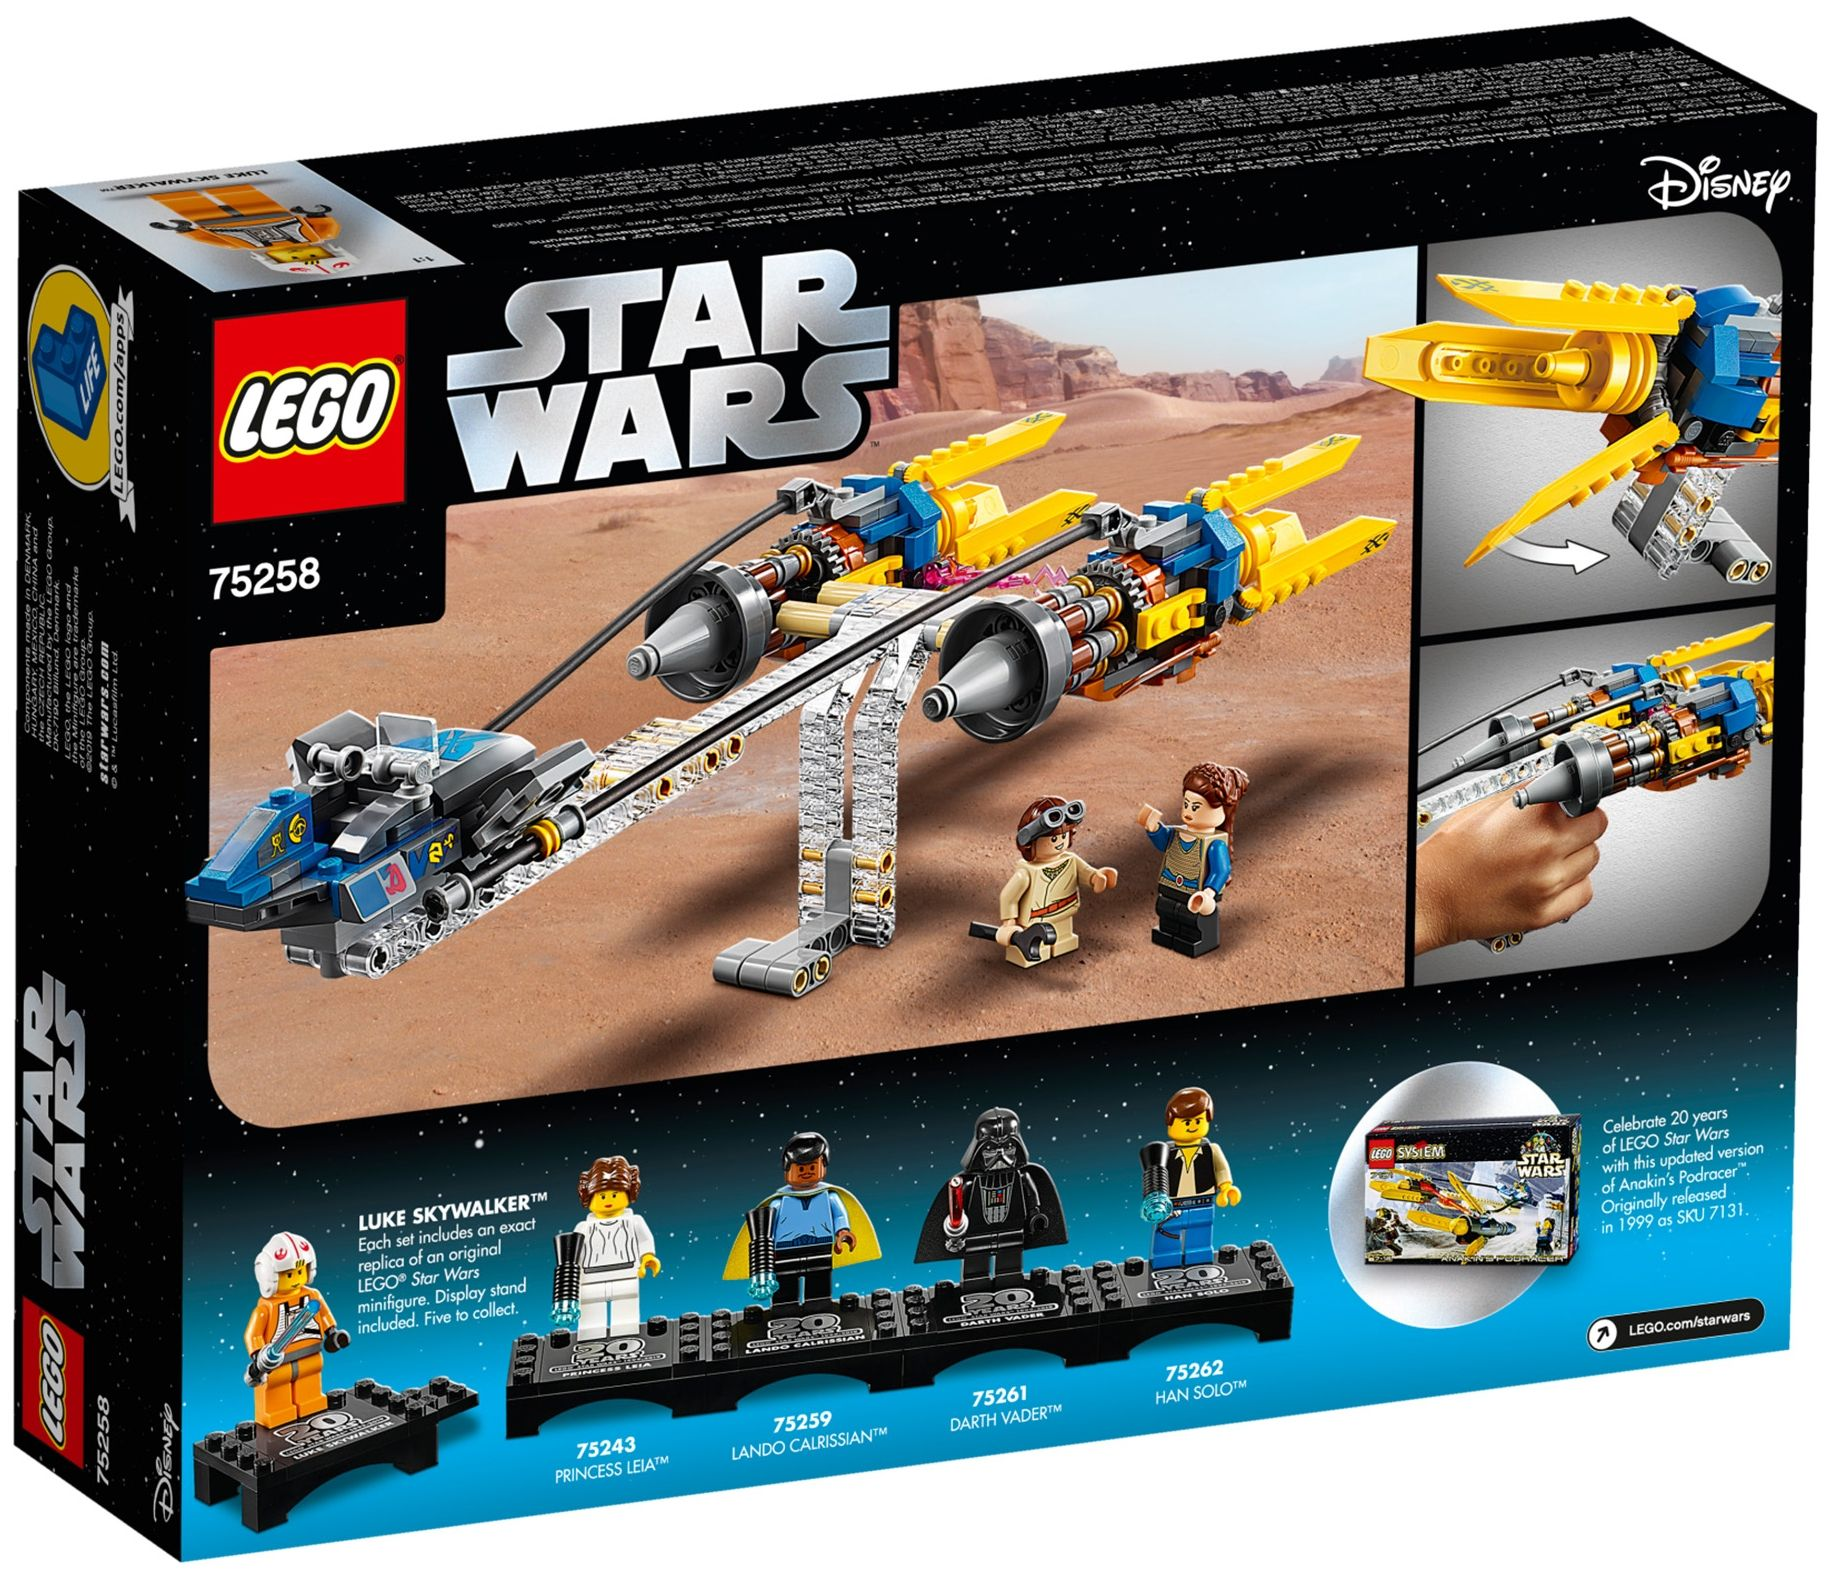 Конструктор Lego Star Wars -  Anakin's Podracer (75258) - 2